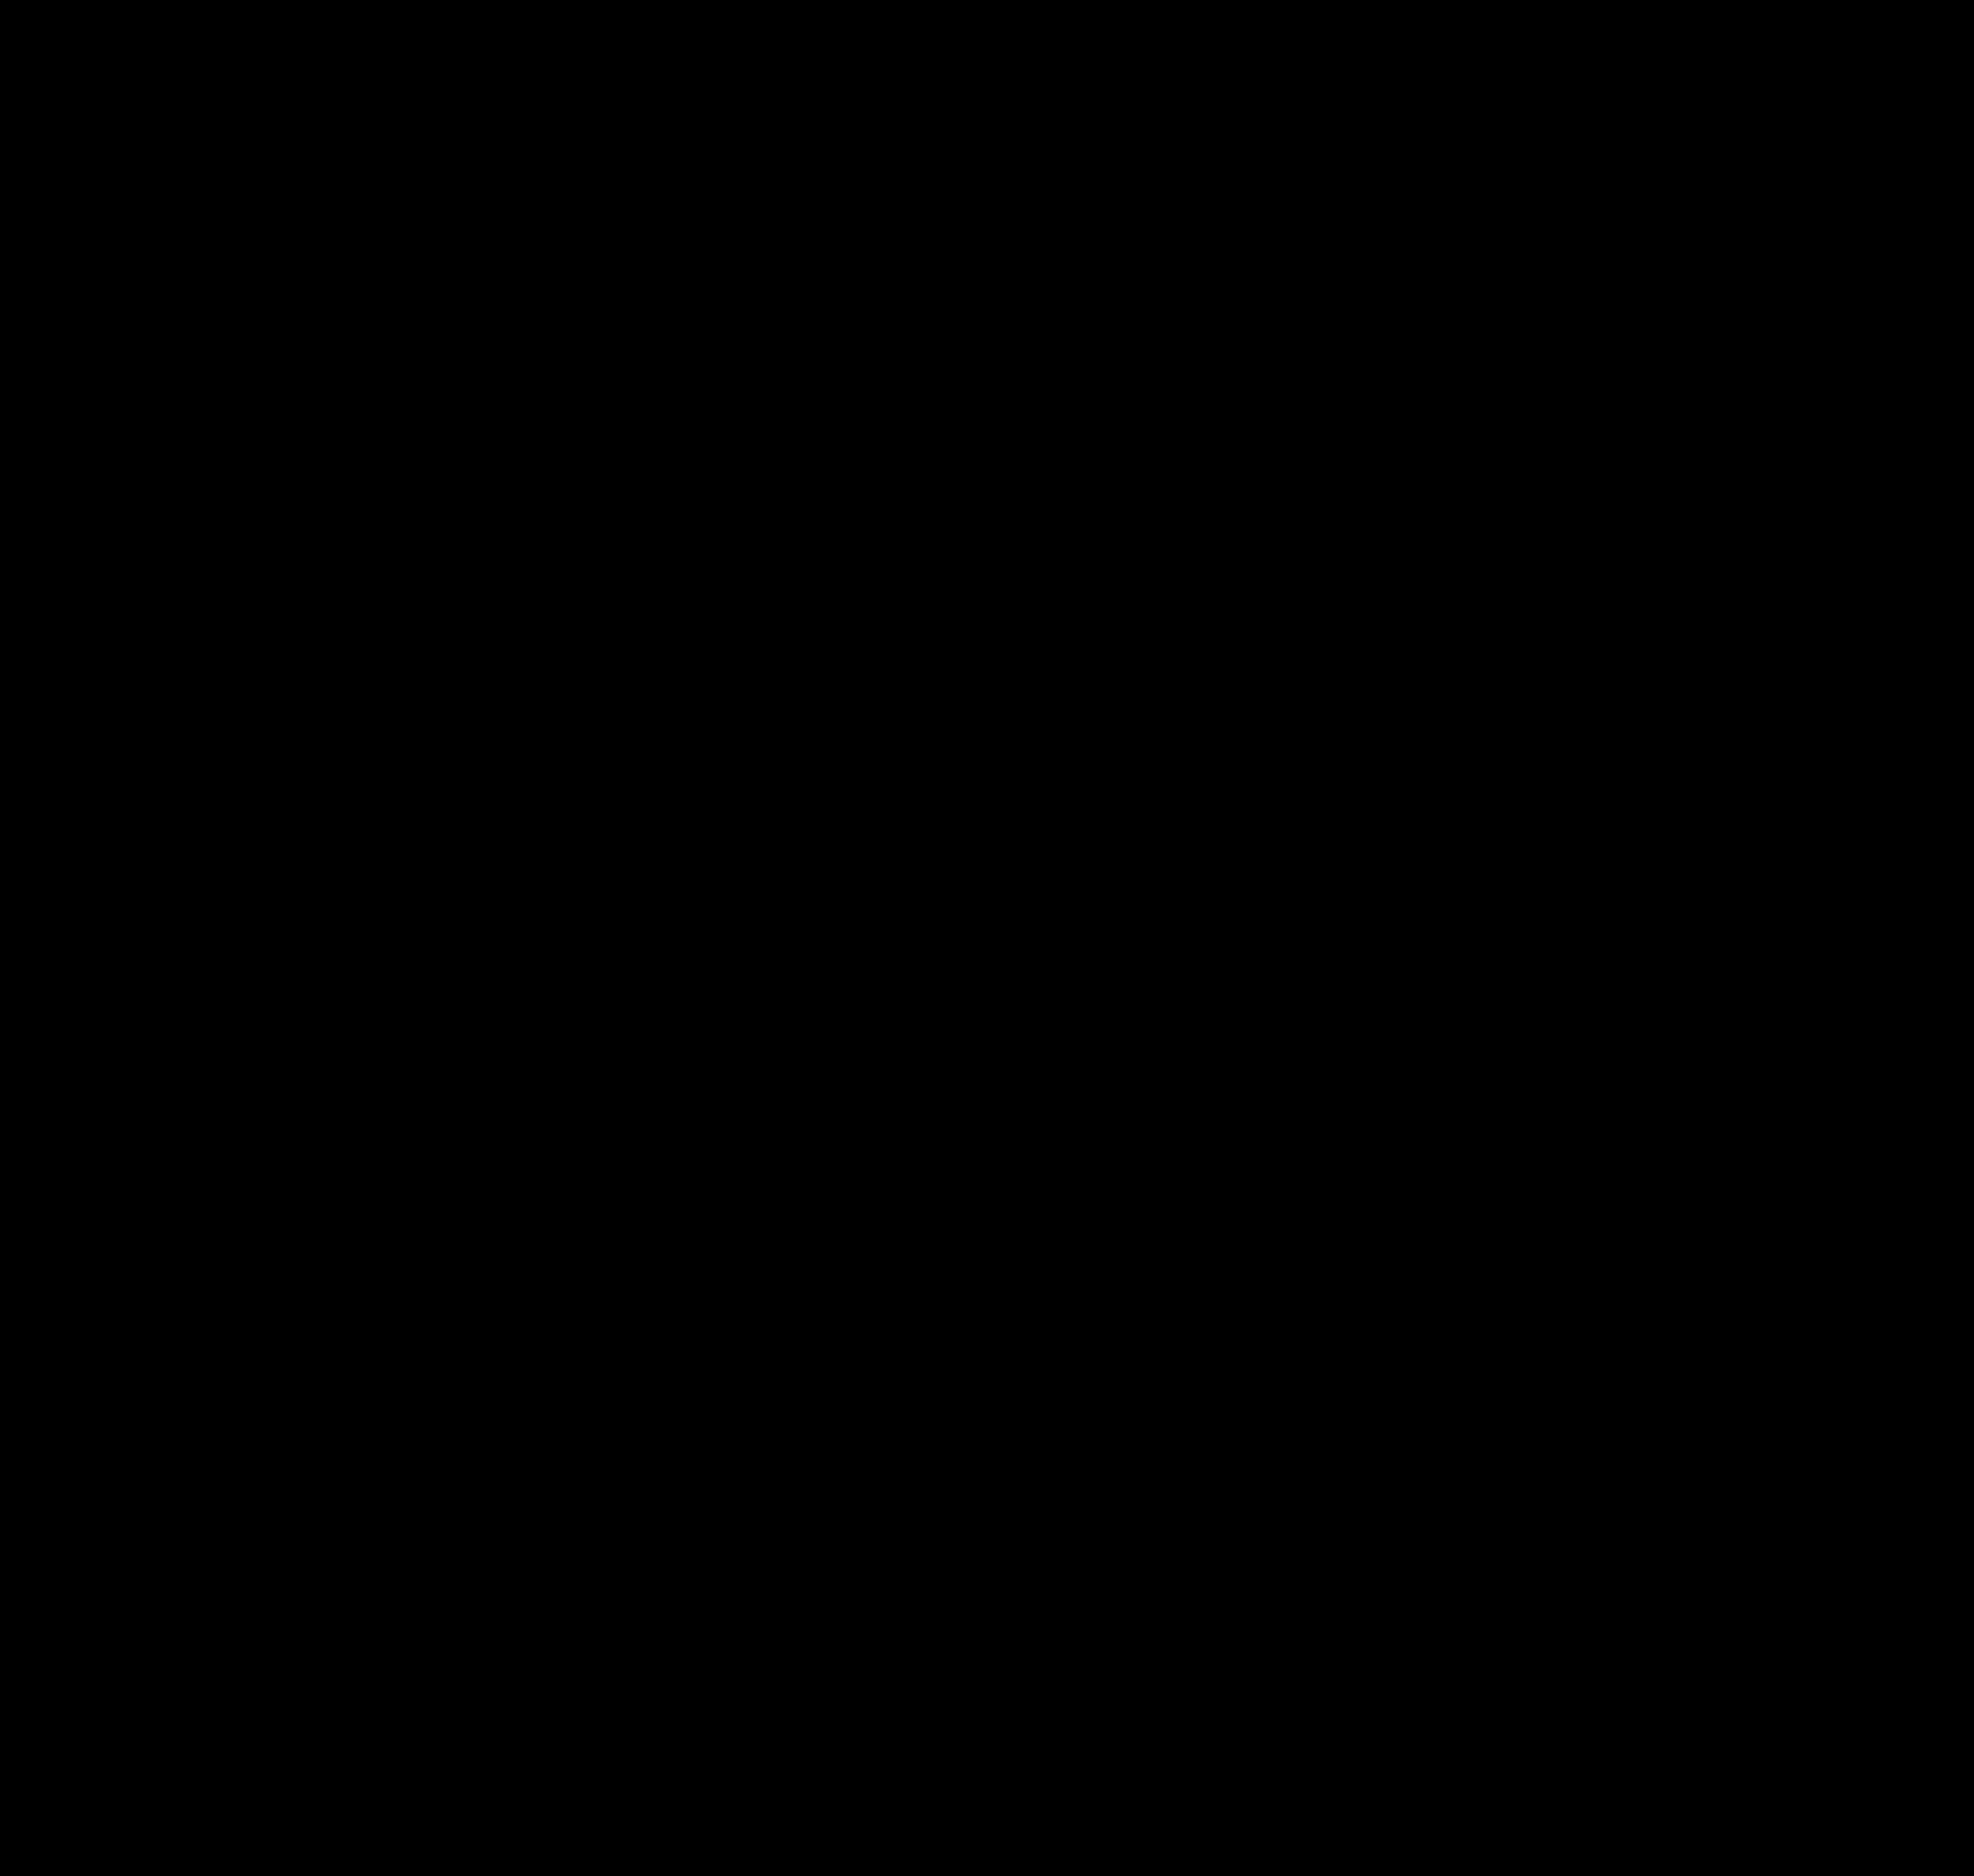 CWD 5th October 2019